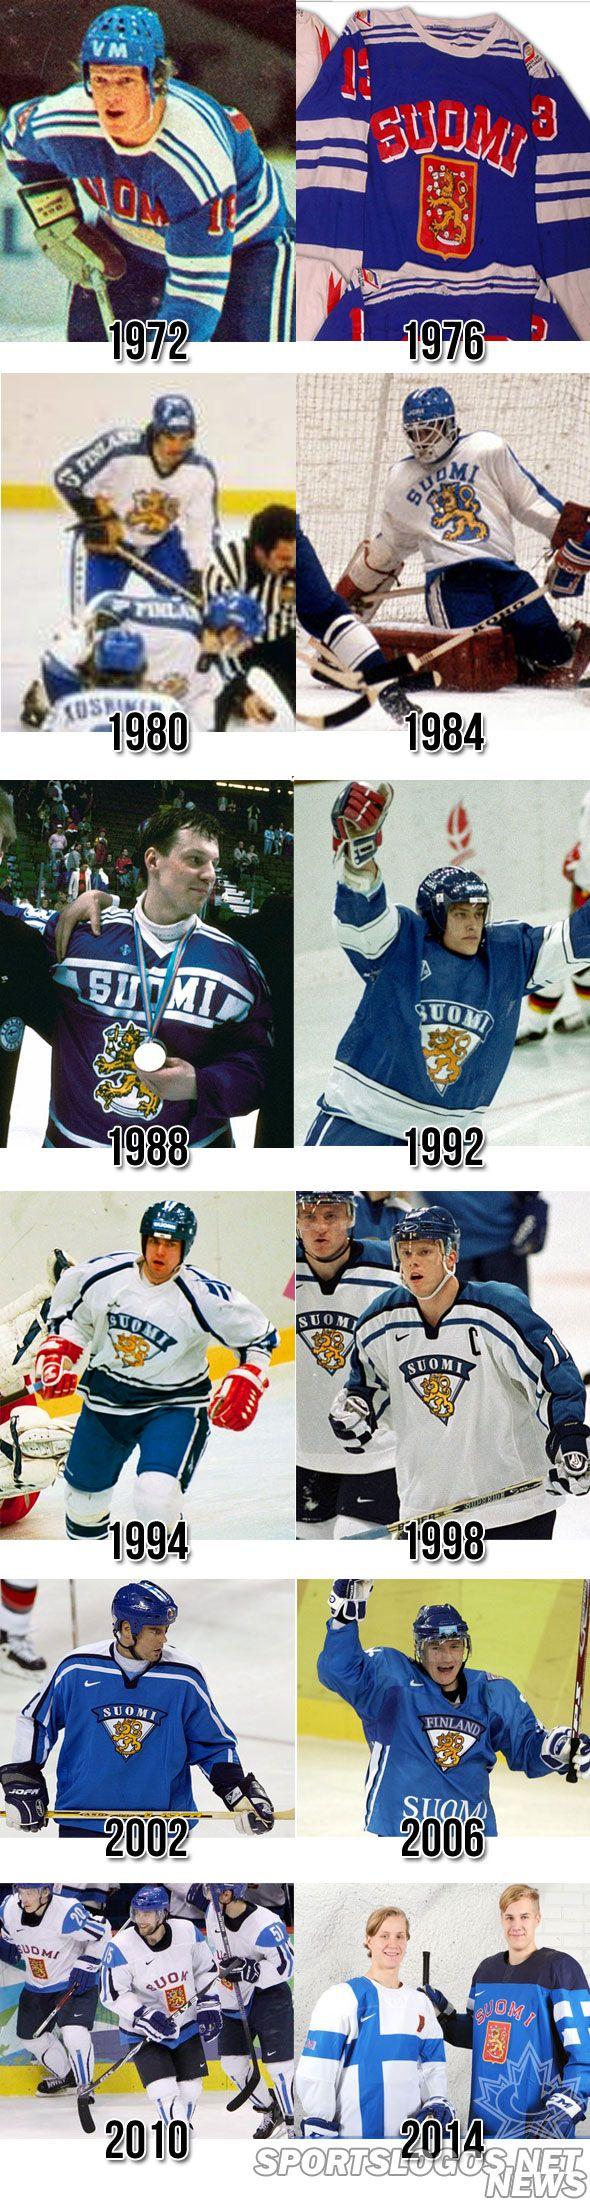 Finland Suomi Olympic Hockey Jersey History 1972-2014